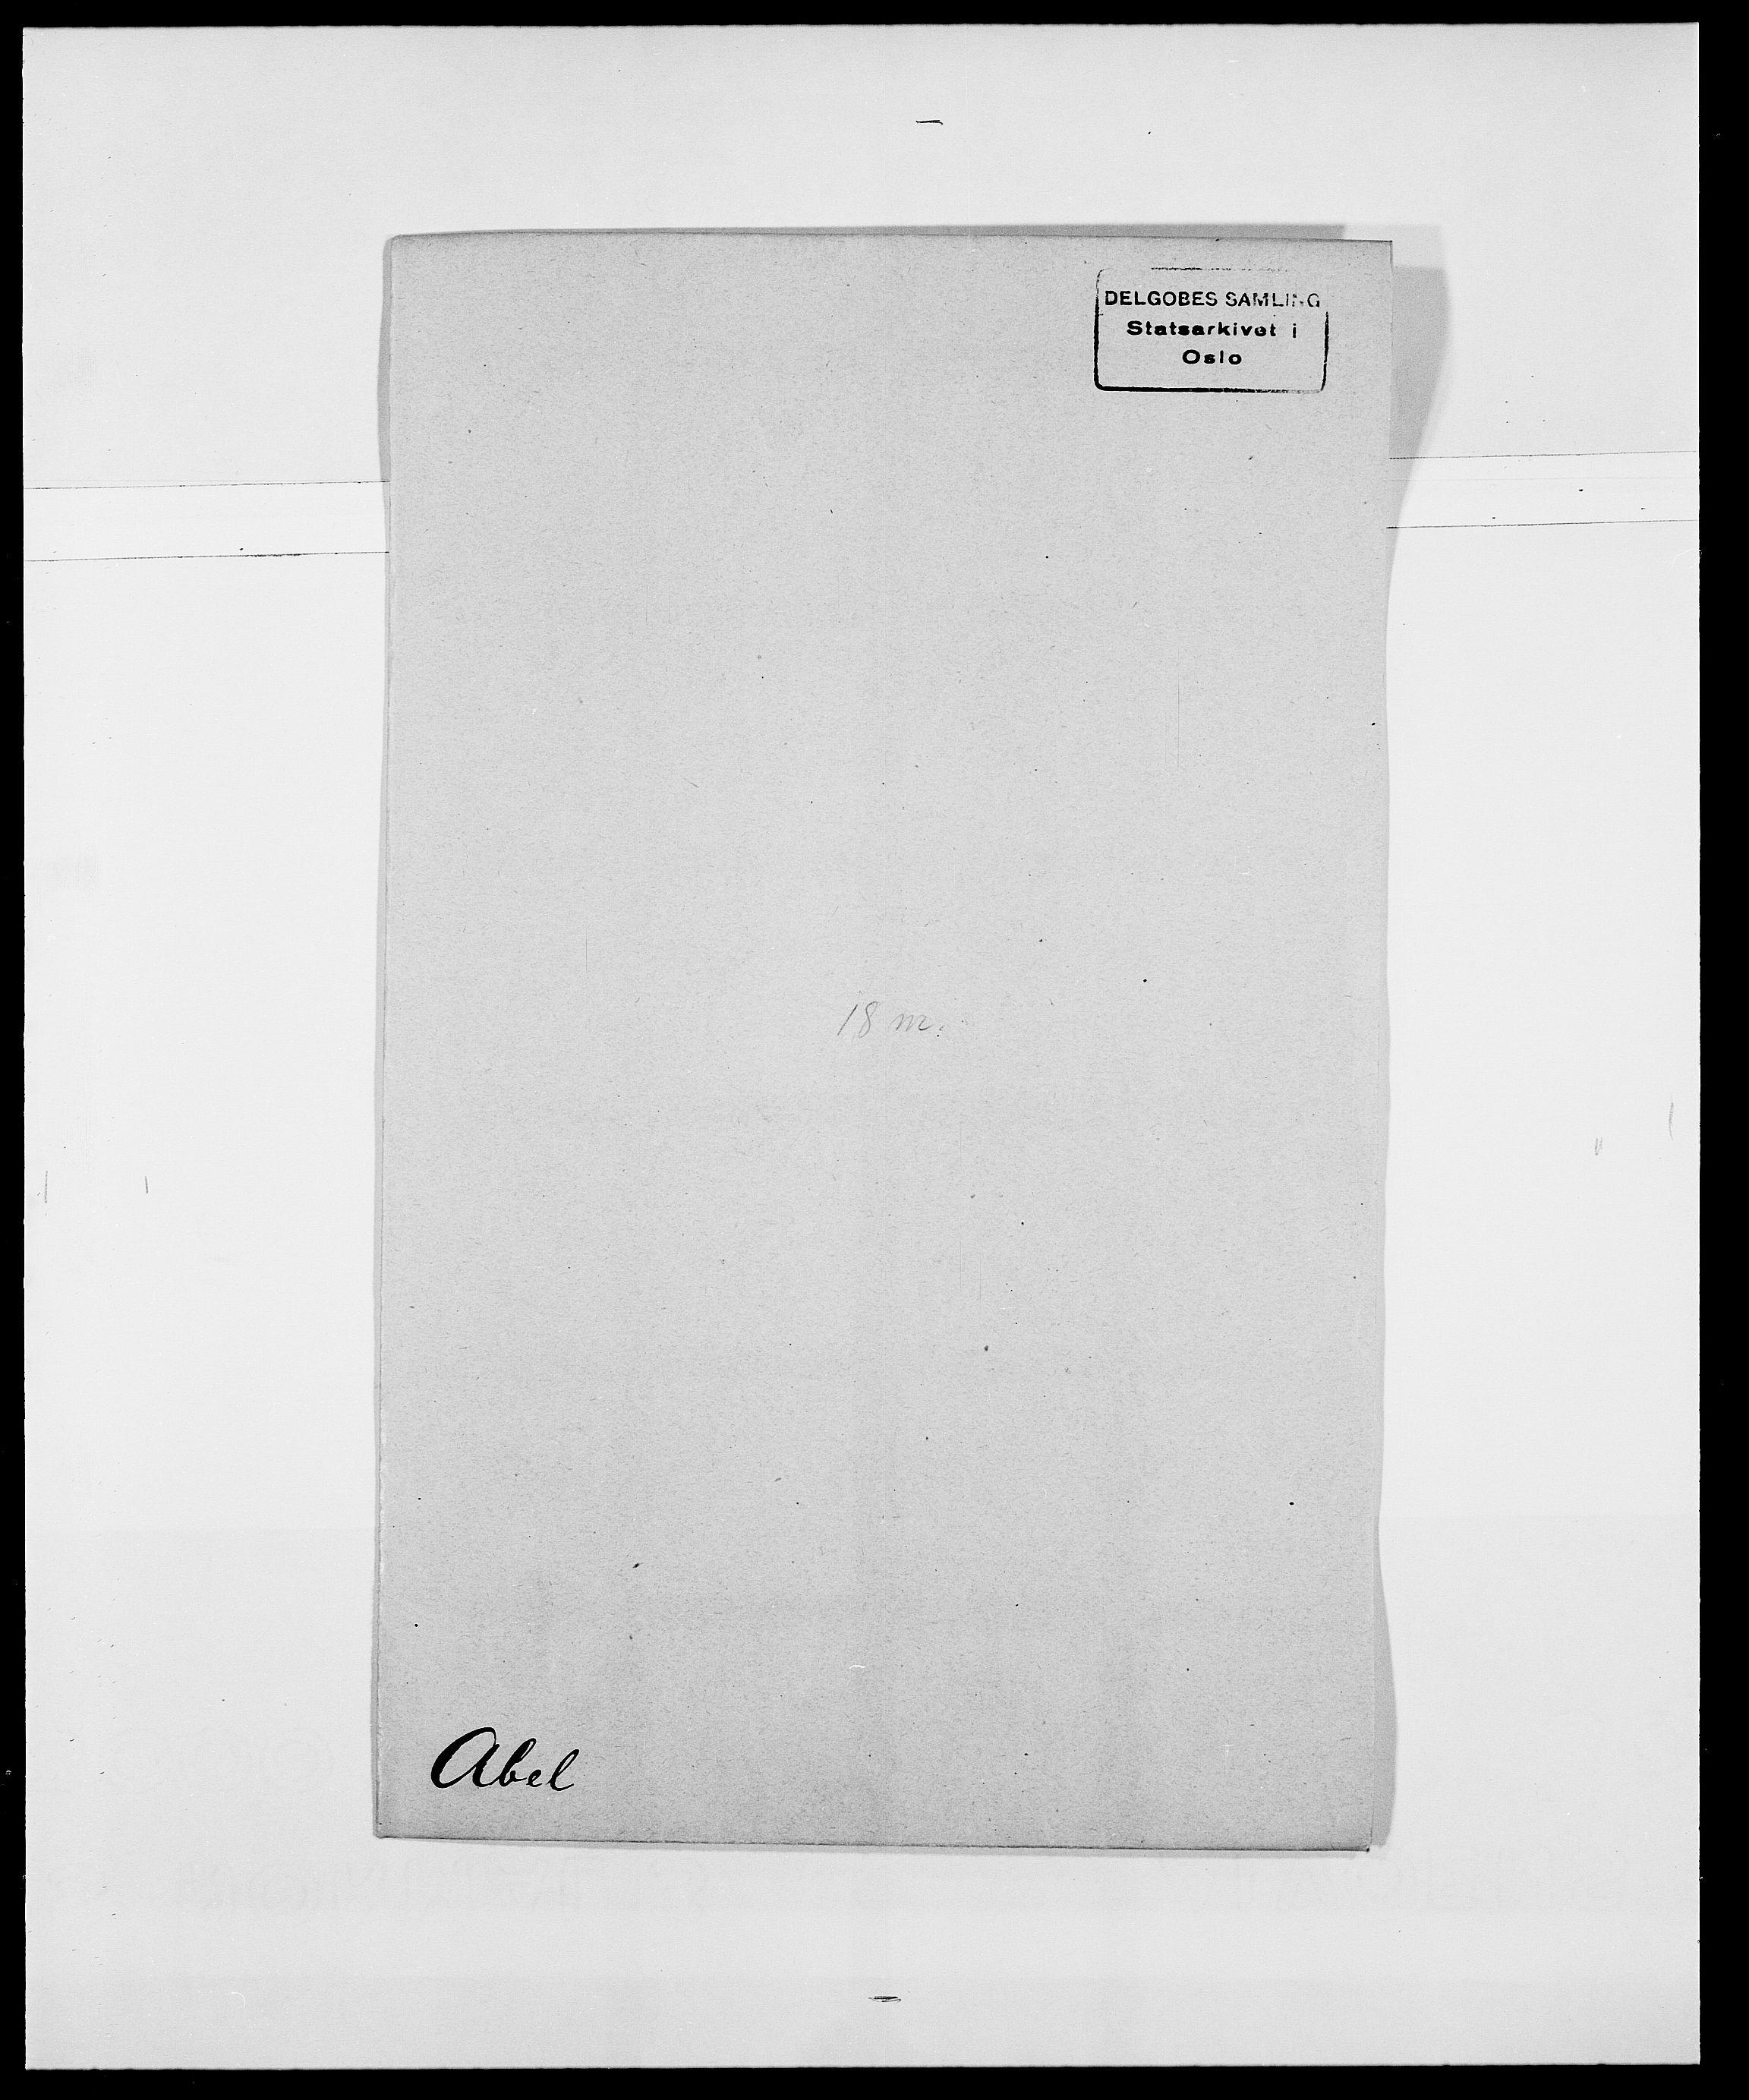 SAO, Delgobe, Charles Antoine - samling, D/Da/L0001: Aabye - Angerman, s. 171